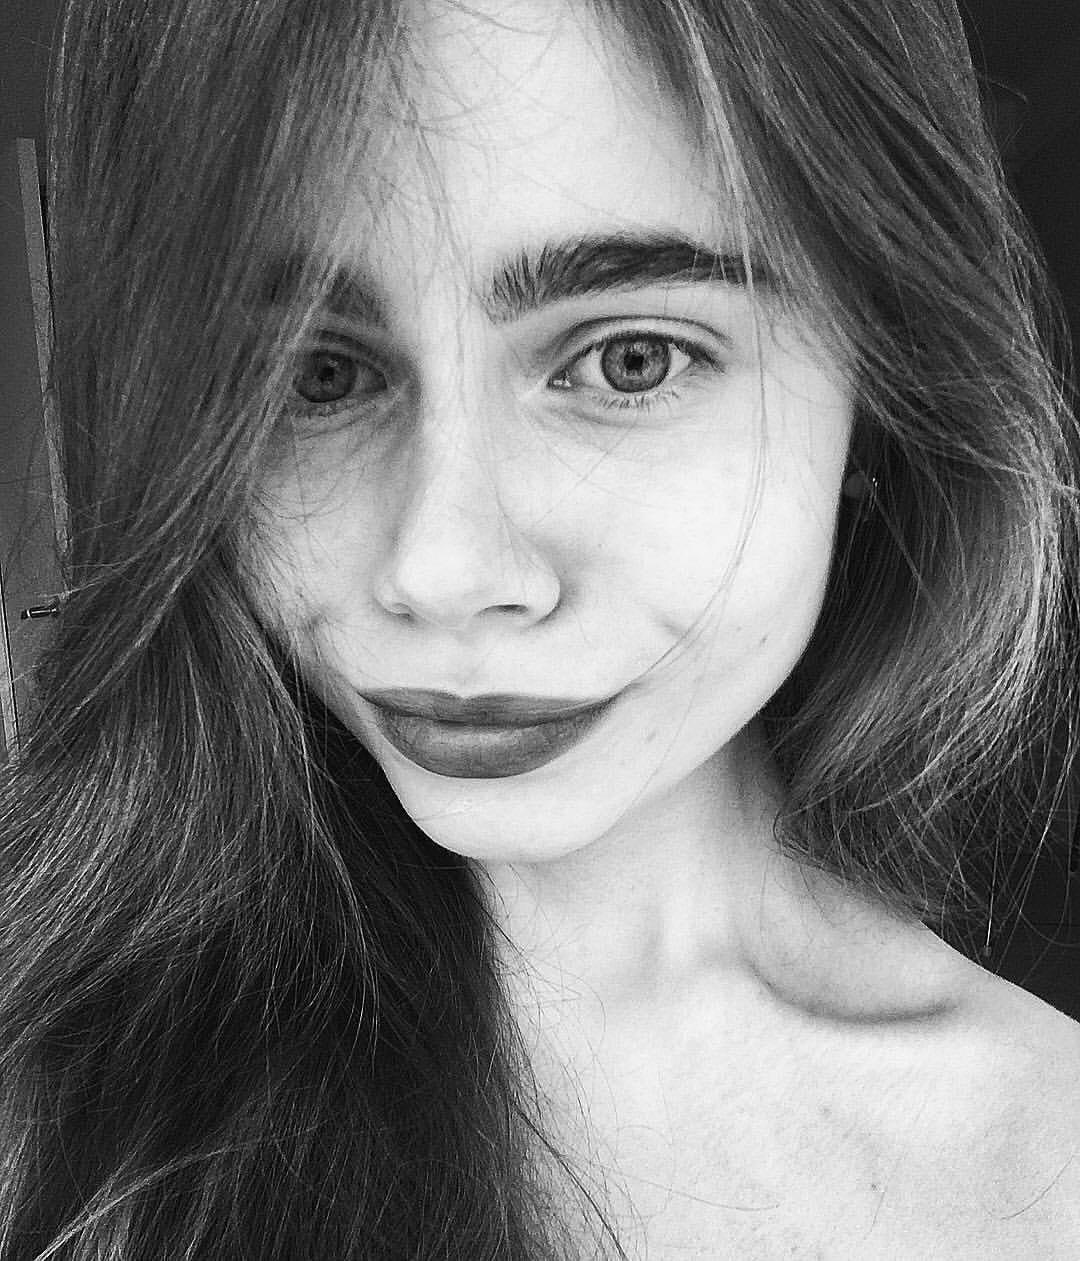 Go to Kira Ikonnikova's profile